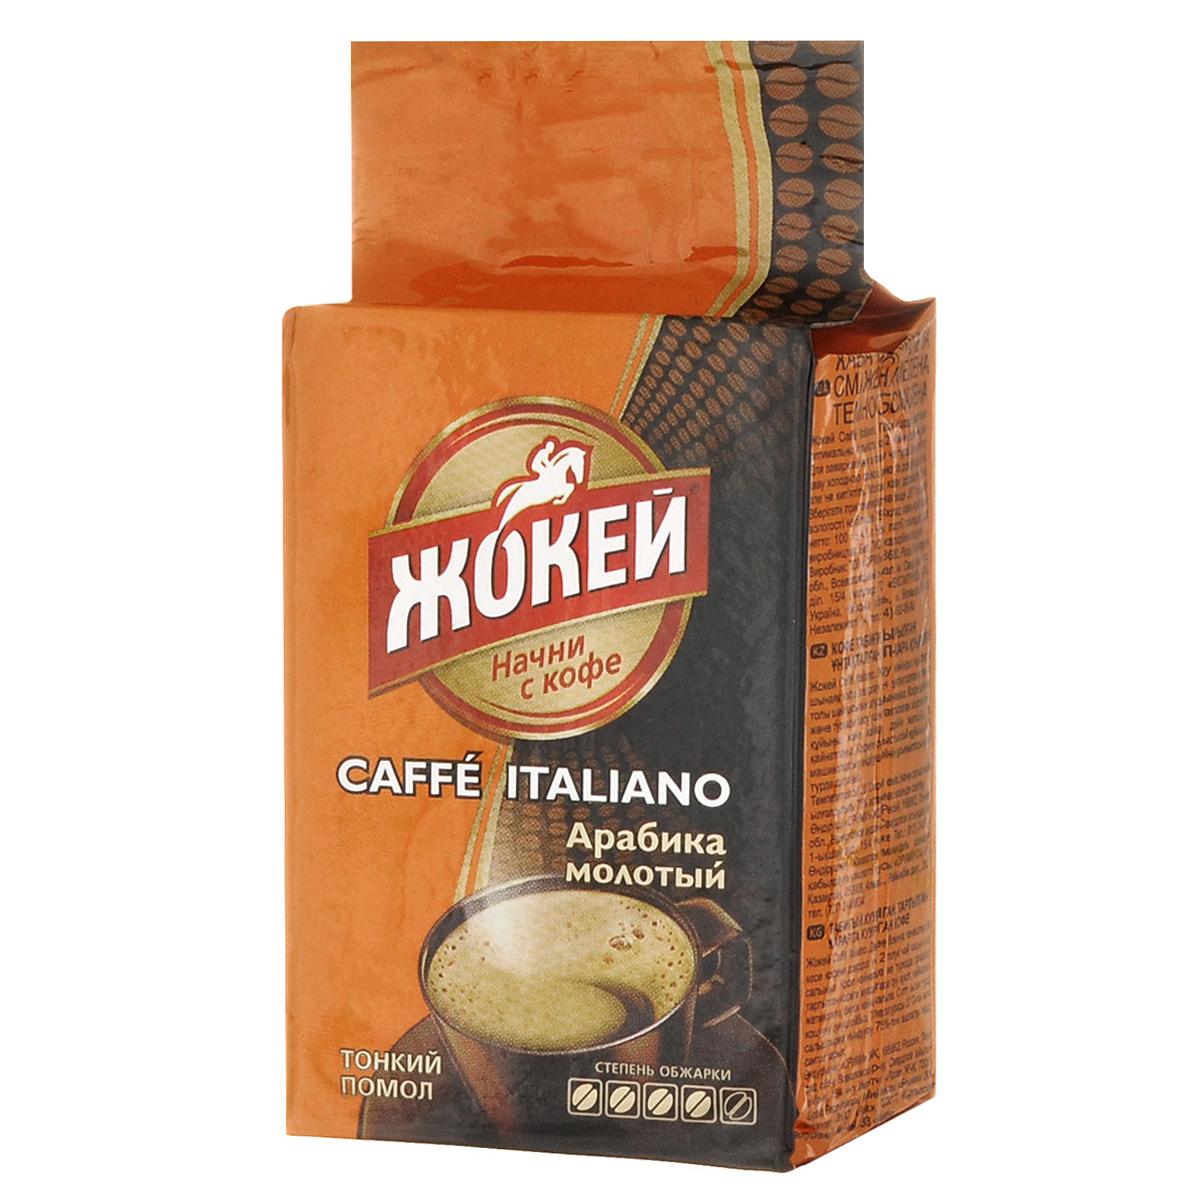 Жокей Caffe Italiano кофе молотый, 100 г